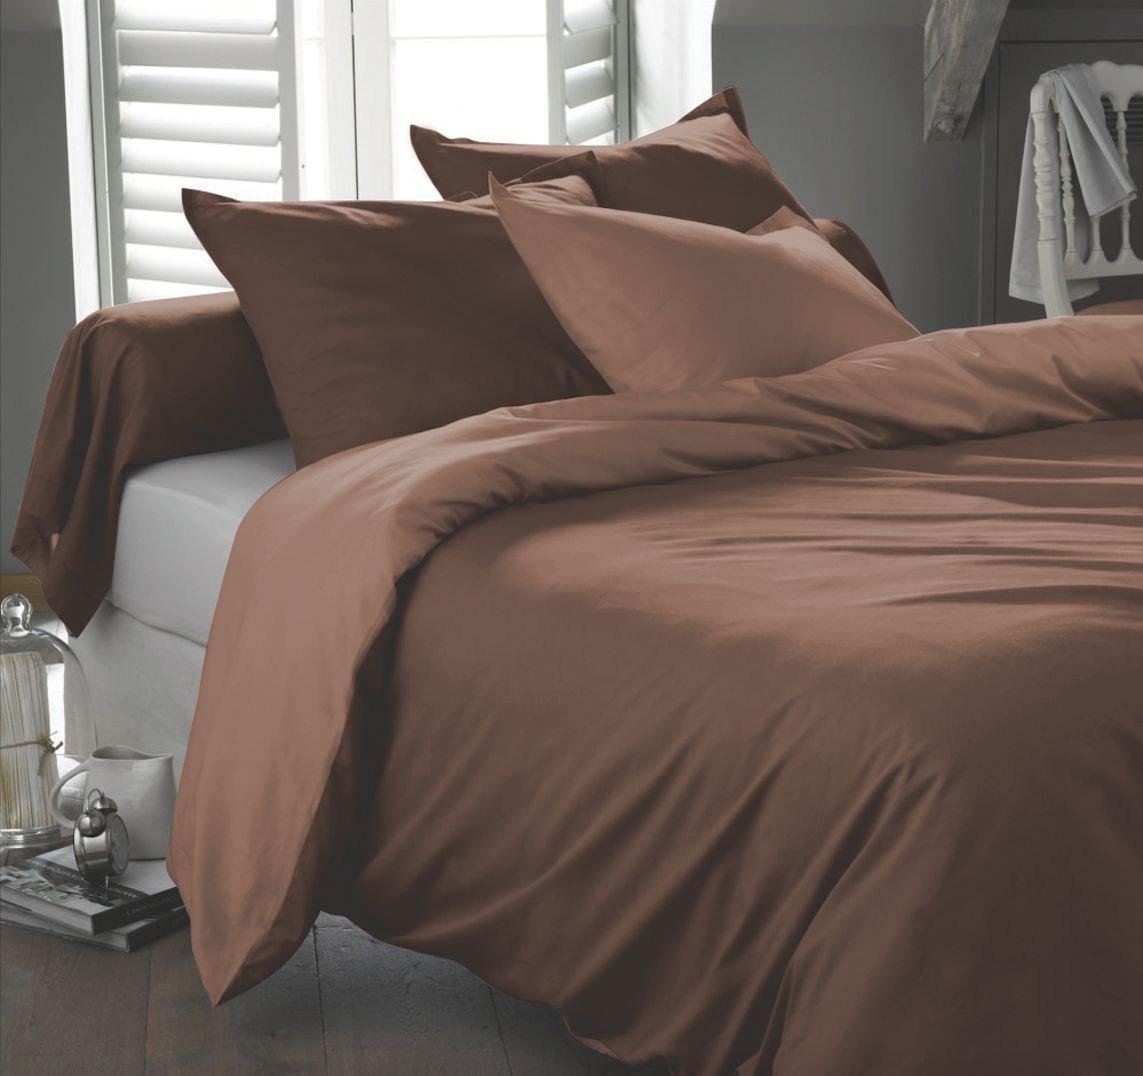 Get Quotations · 1800 Bed Sheet Set Deep Pocket Sheets Bedding /Queen/Chocolate